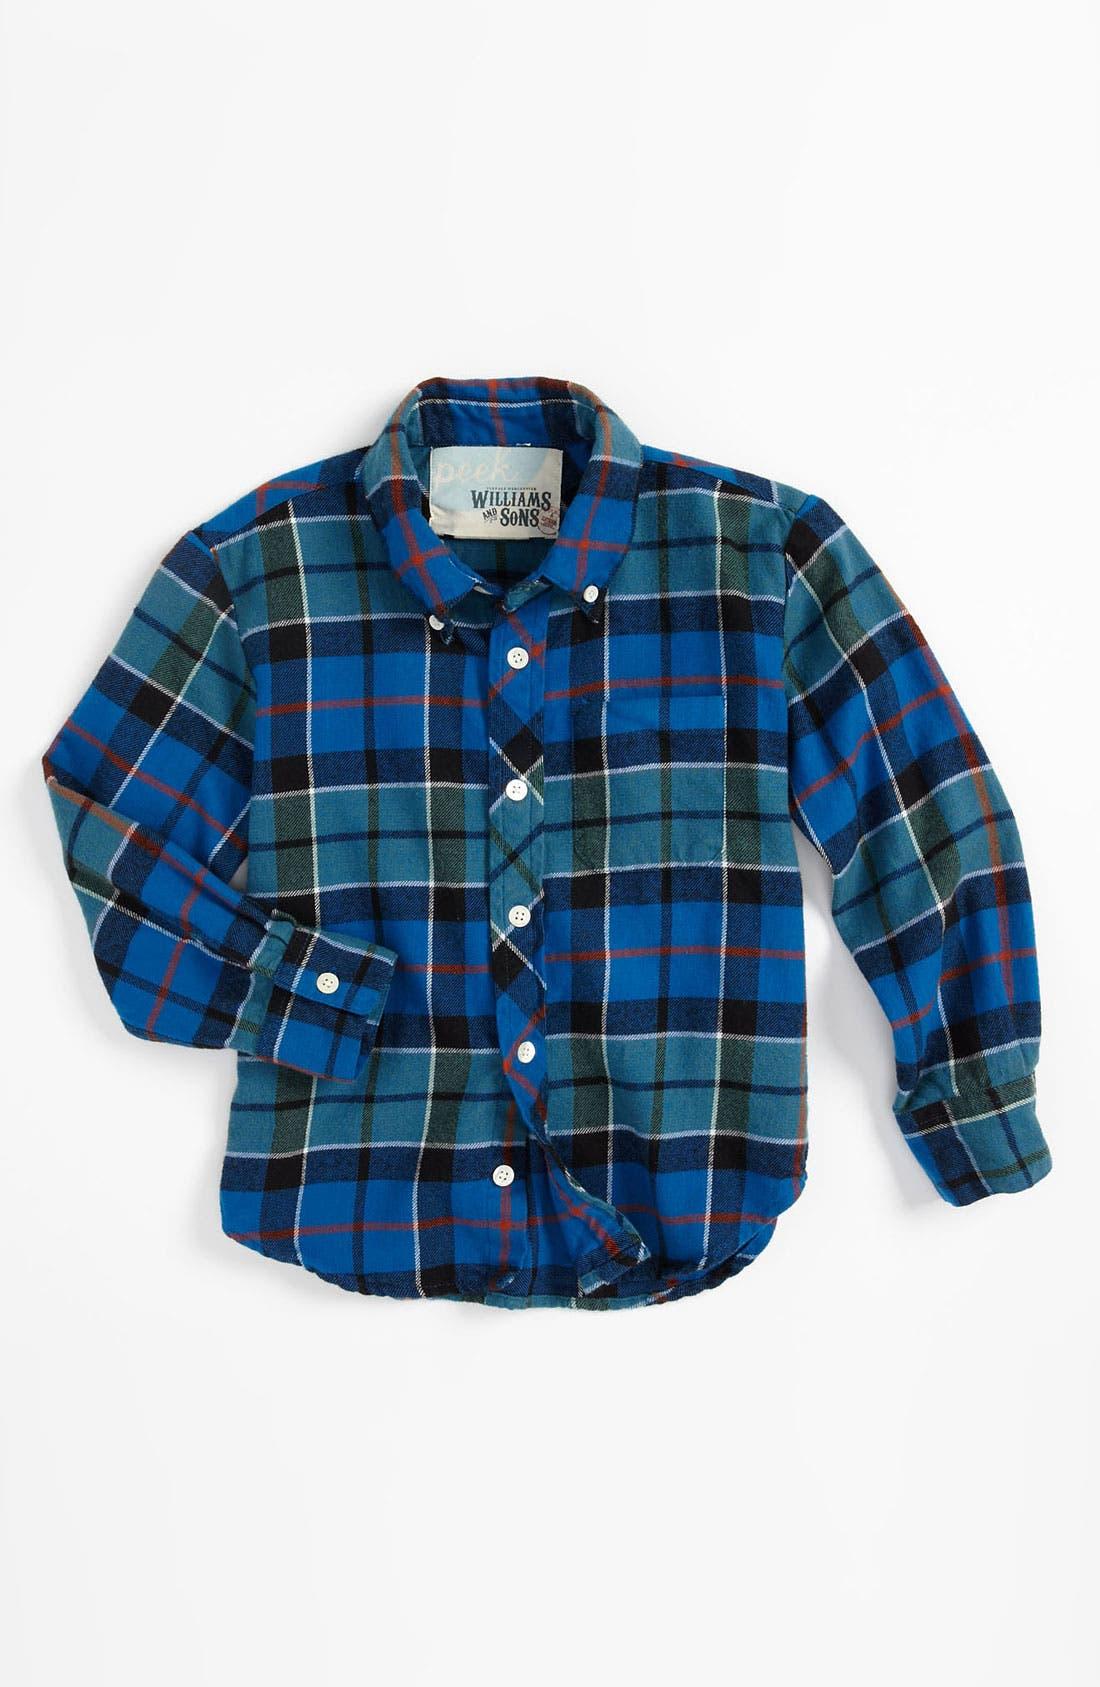 Main Image - Peek 'Barstow' Plaid Shirt (Toddler, Little Boys & Big Boys)